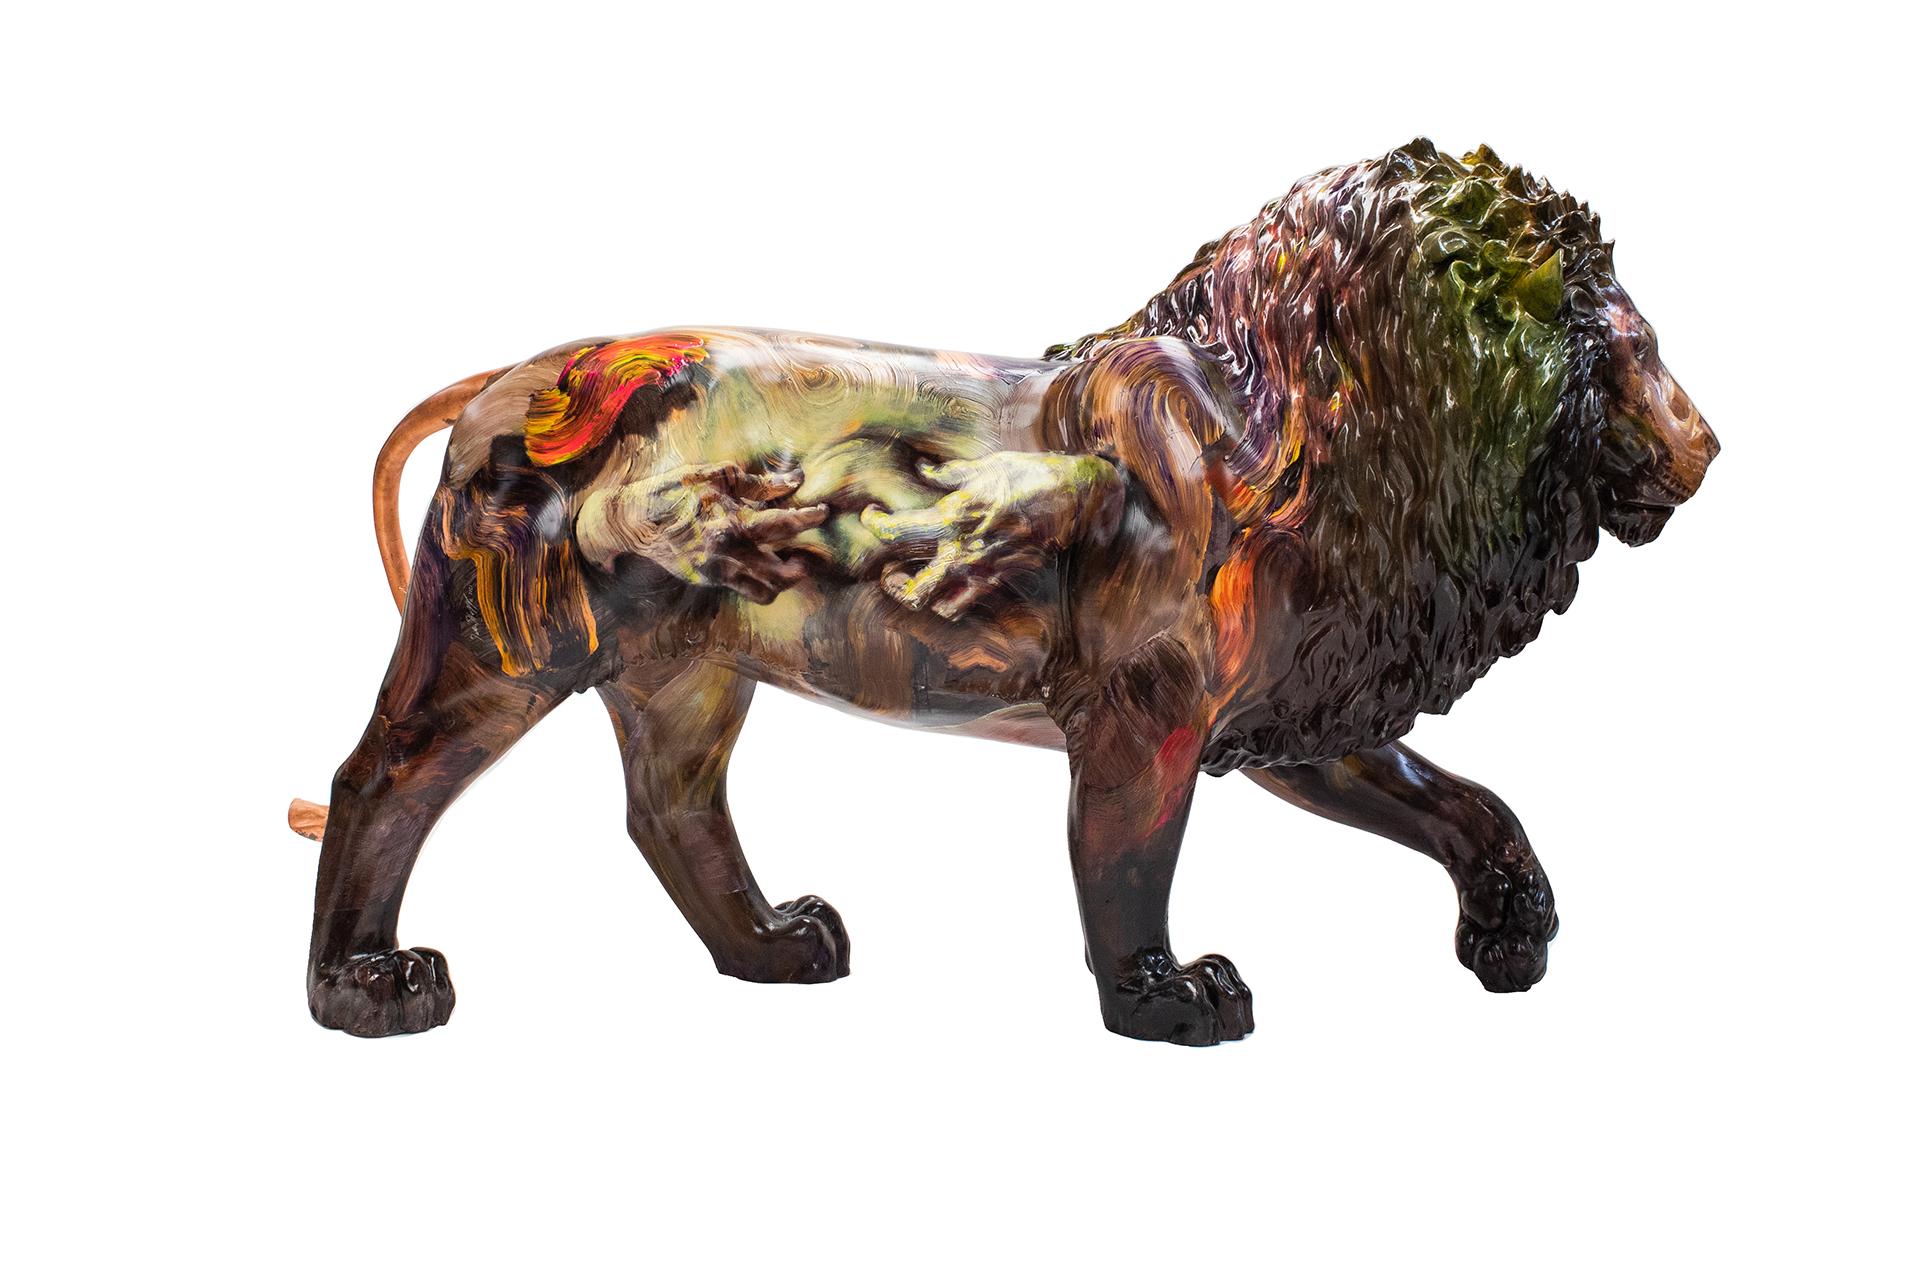 Tusk Lion Trail 2021 - Sara Shamma - Generously sponsored by Animal Friends Image Credit: Nick Andrews